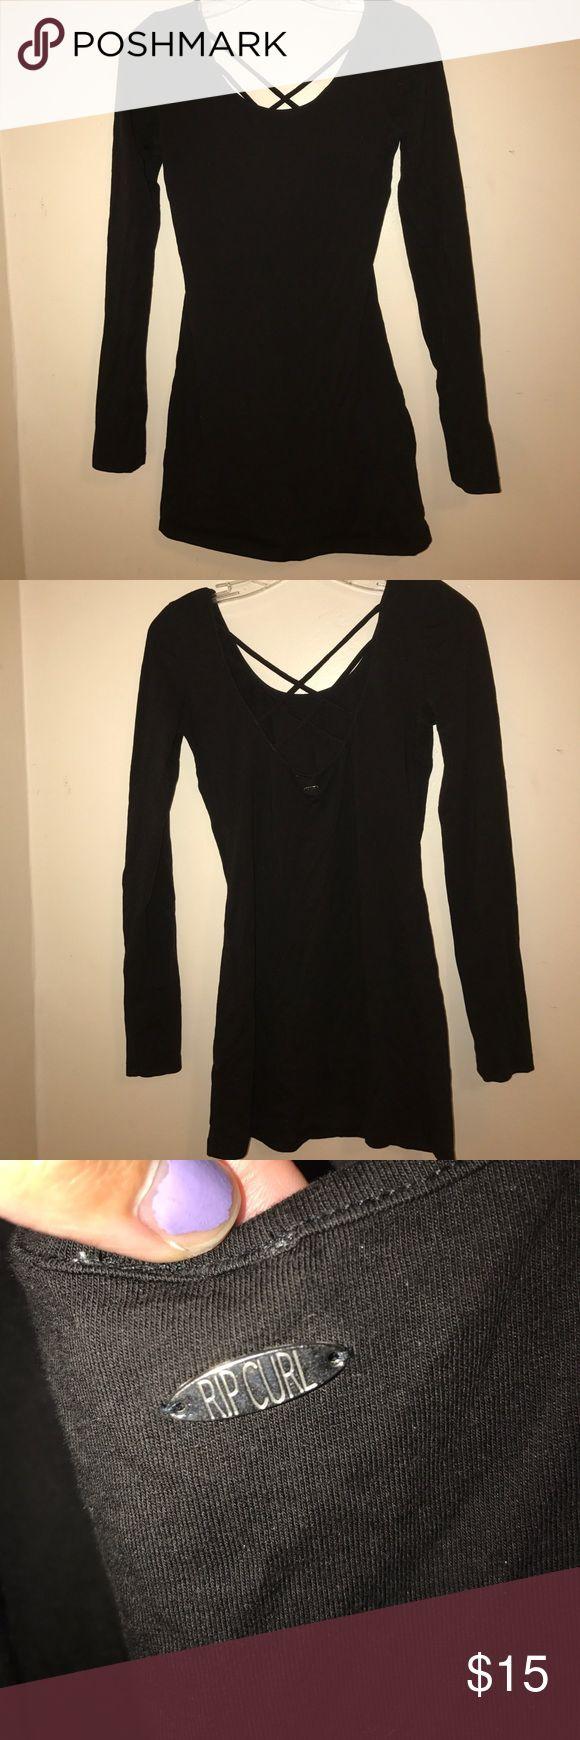 Rip Curl long sleeve dress Never worn Tight long sleeve dress with criss cross back Rip Curl Dresses Mini